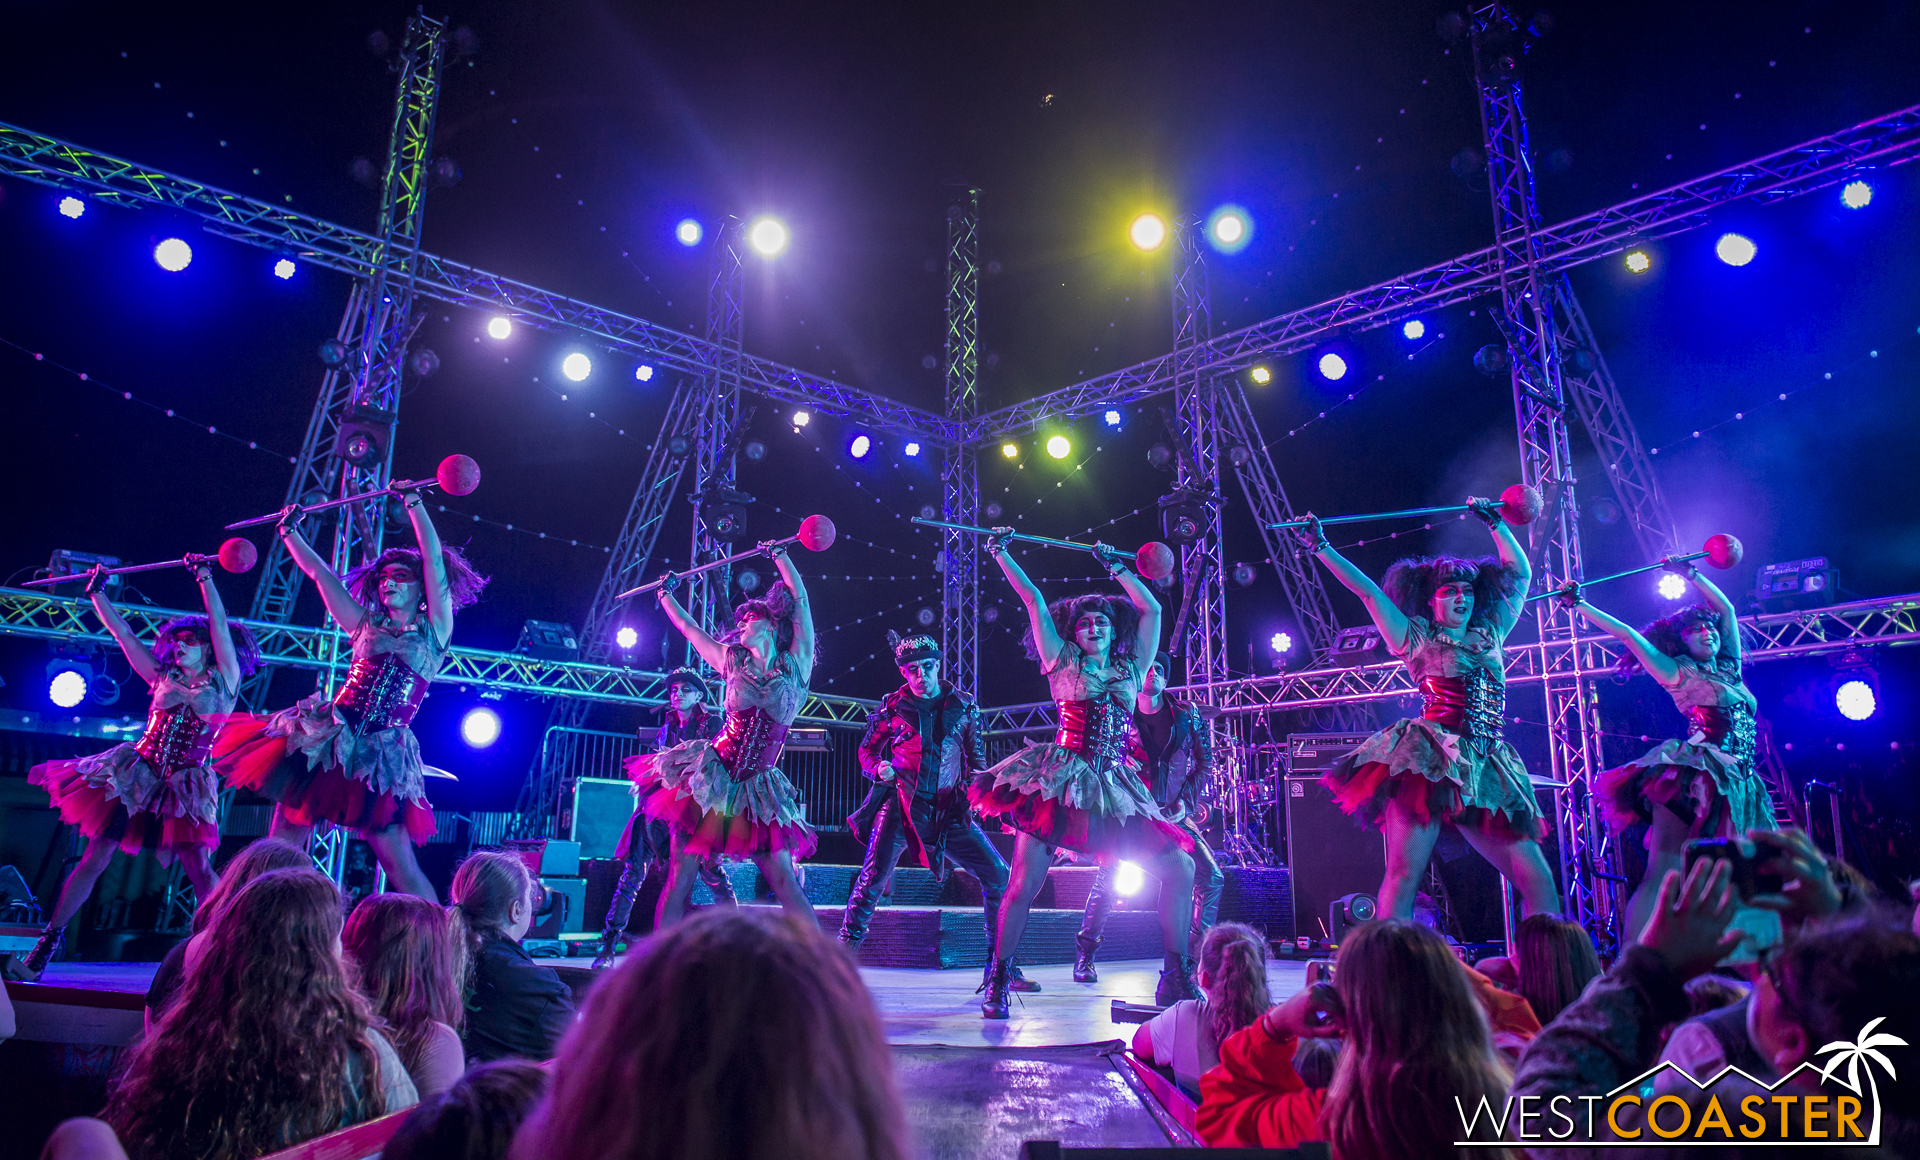 The Voodoo Dolls dancers take the floor afterward.